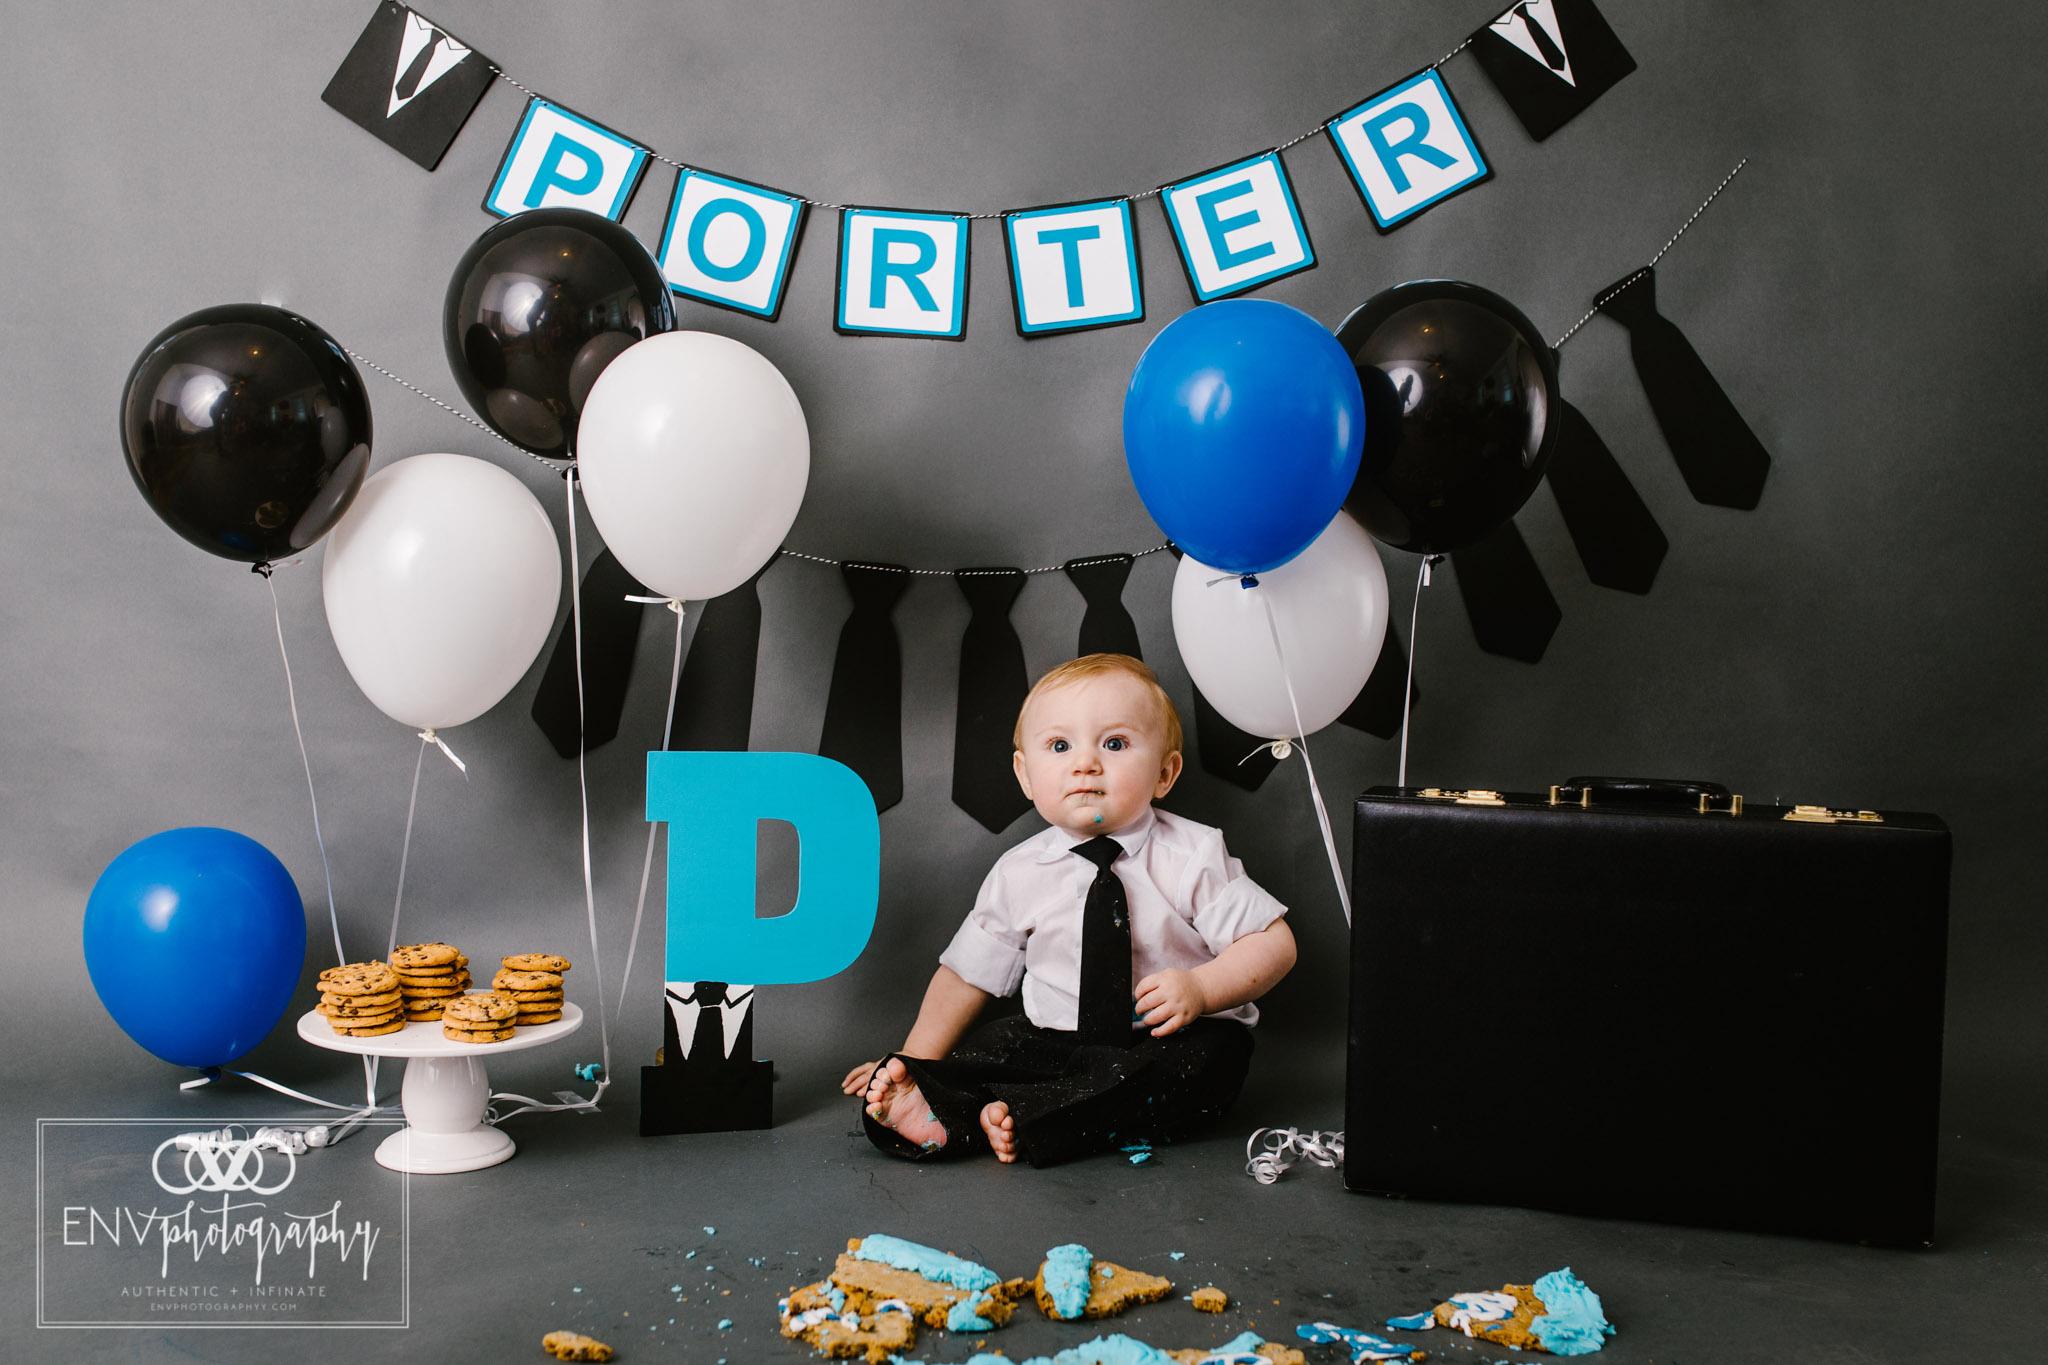 Porterfirstbirthday (85).jpg